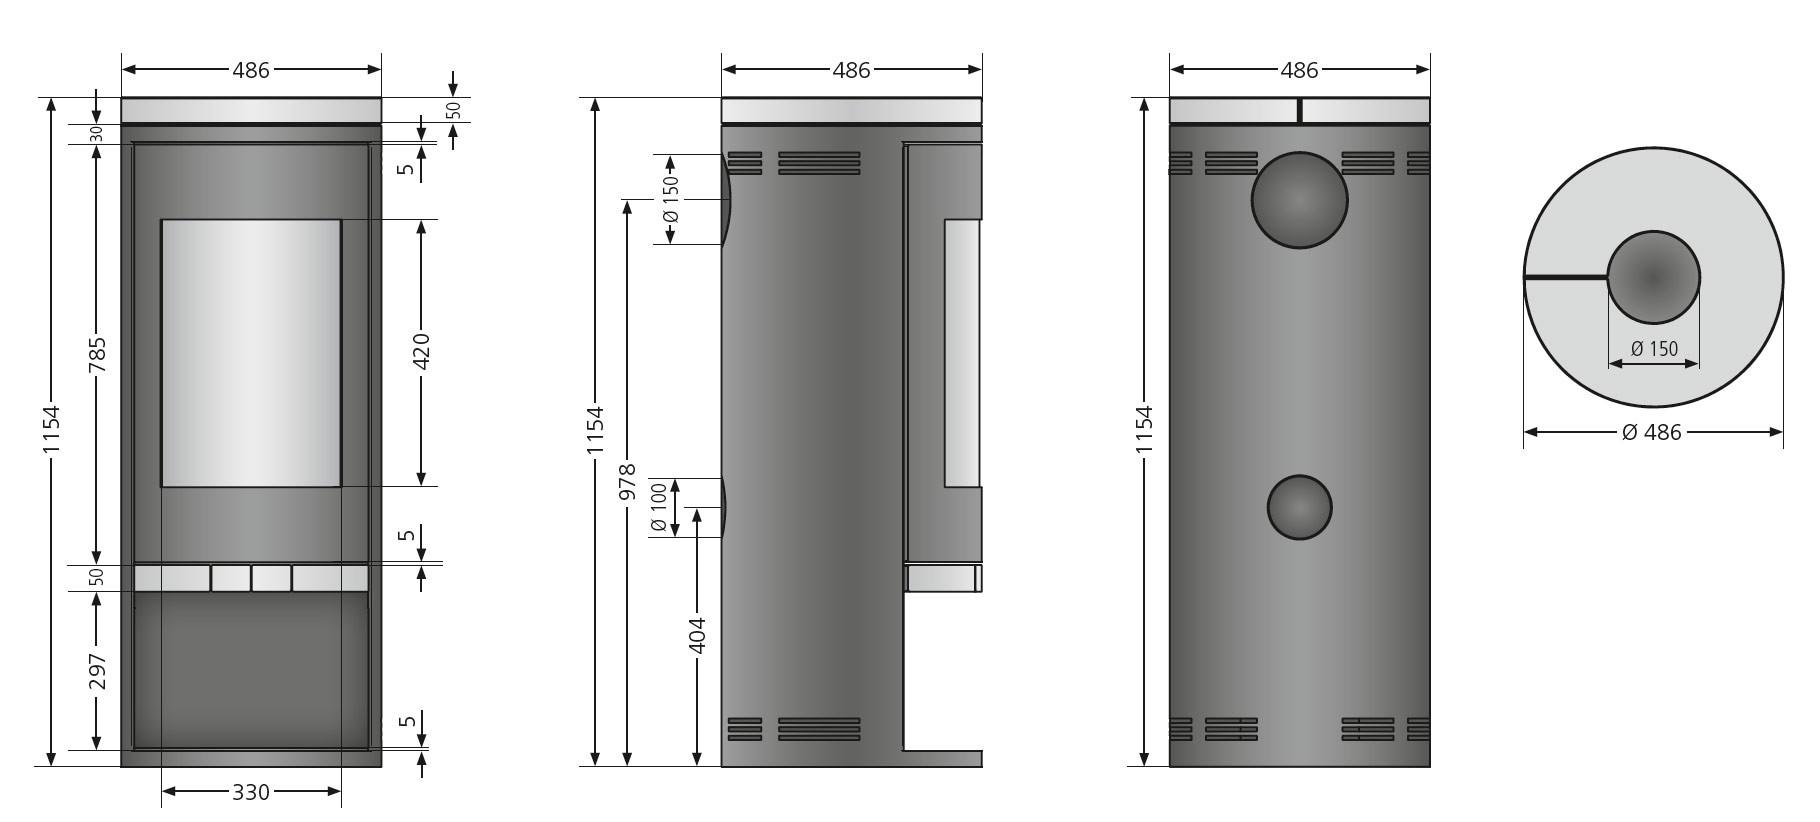 Kaminofen Justus Faro Raumluftunabhängig Schwarz Stahl 6kW Bild 3